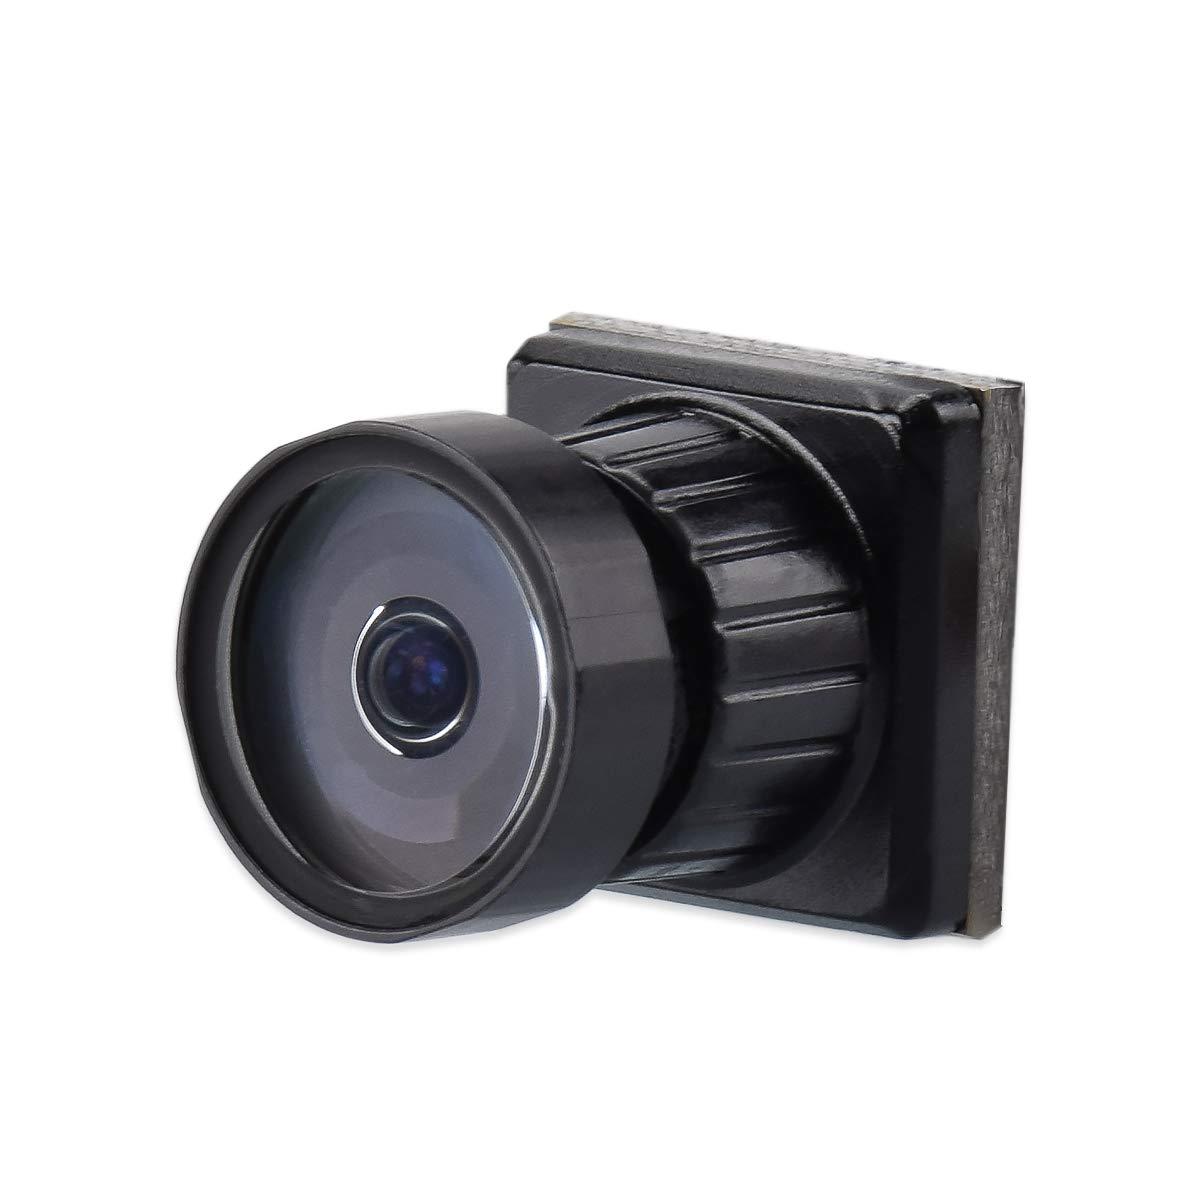 BETAFPV 1200TVL FPV Camera 1/3'' CMOS Sensor HD Camera 16:9 160 Deg NTSC for Tiny Whoop Brushless Racing Drone